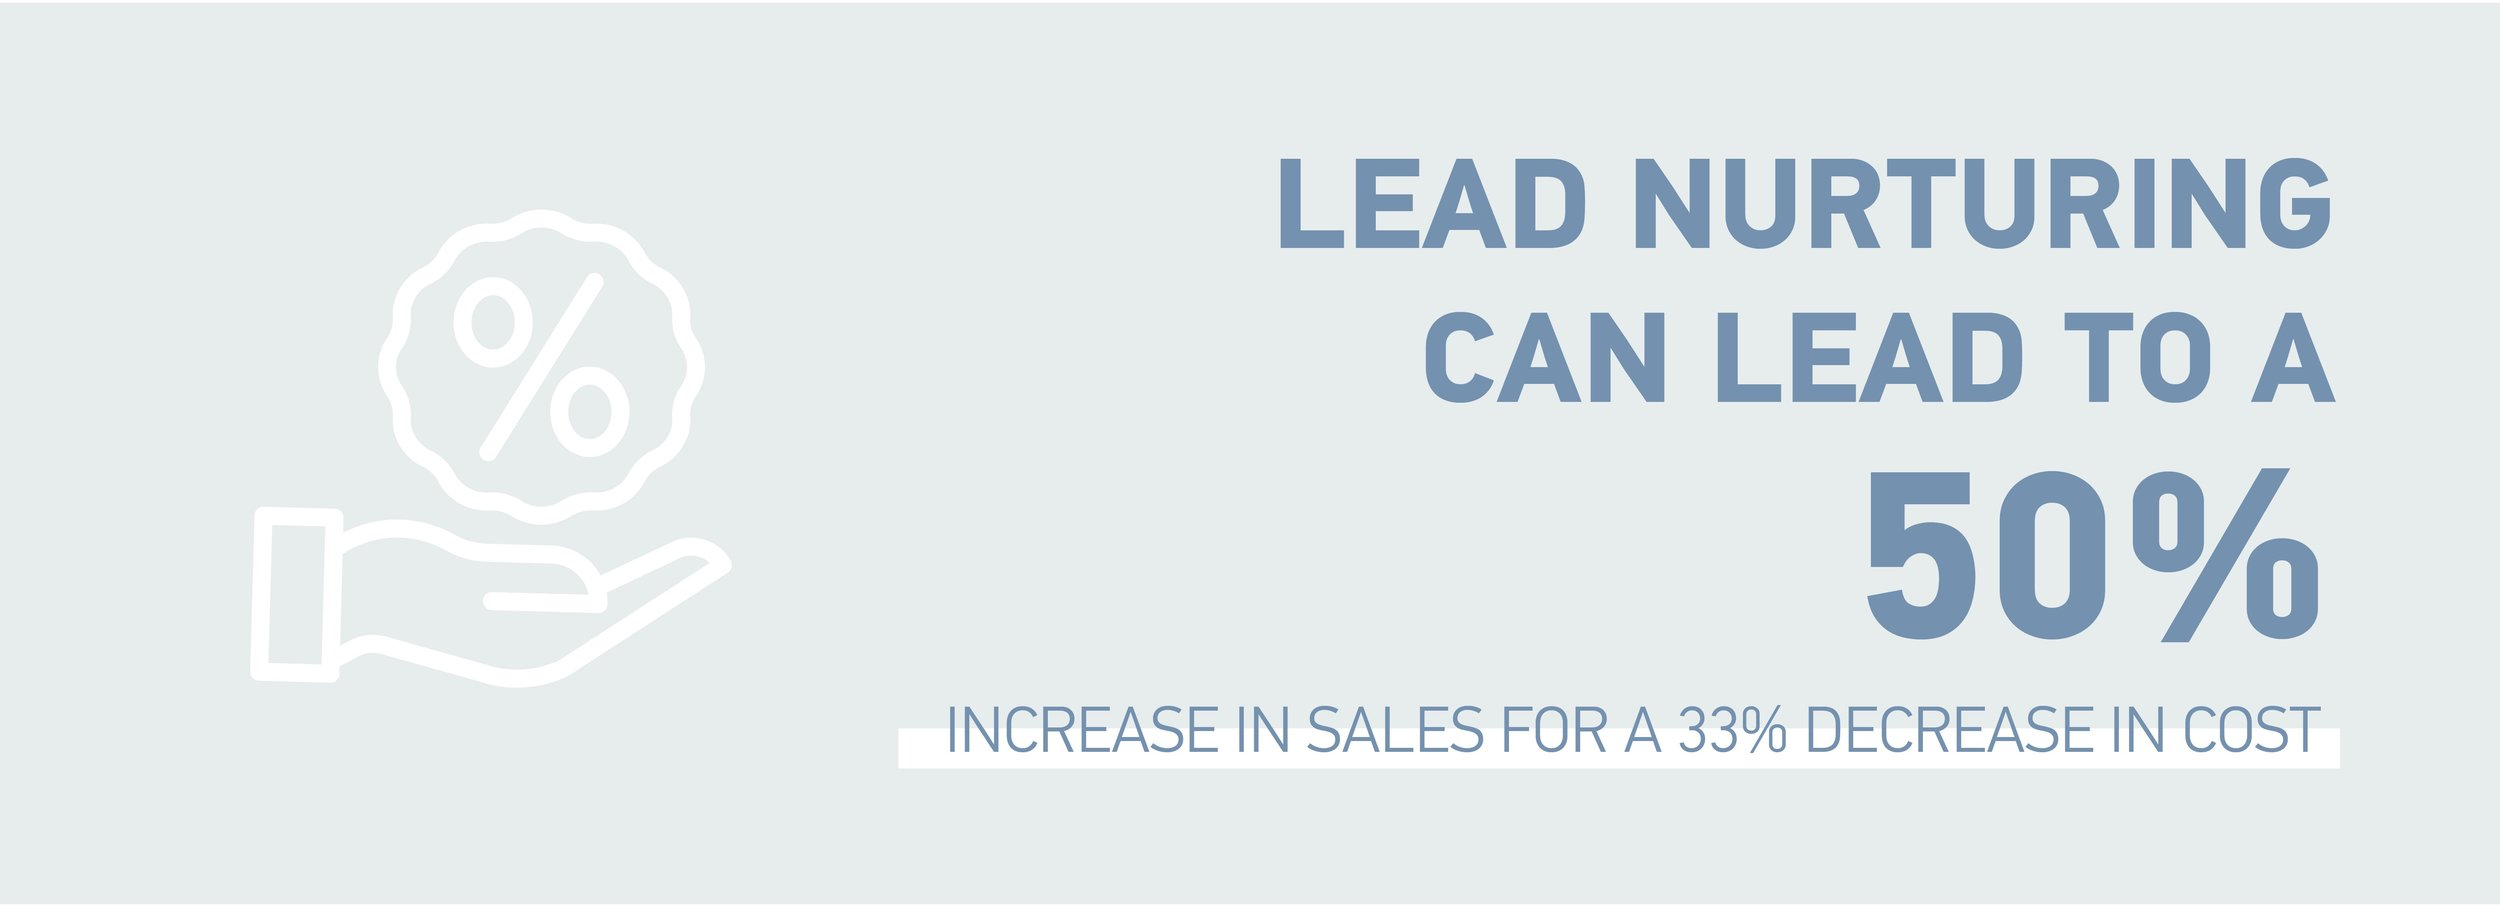 Lead Generation Statistic #4